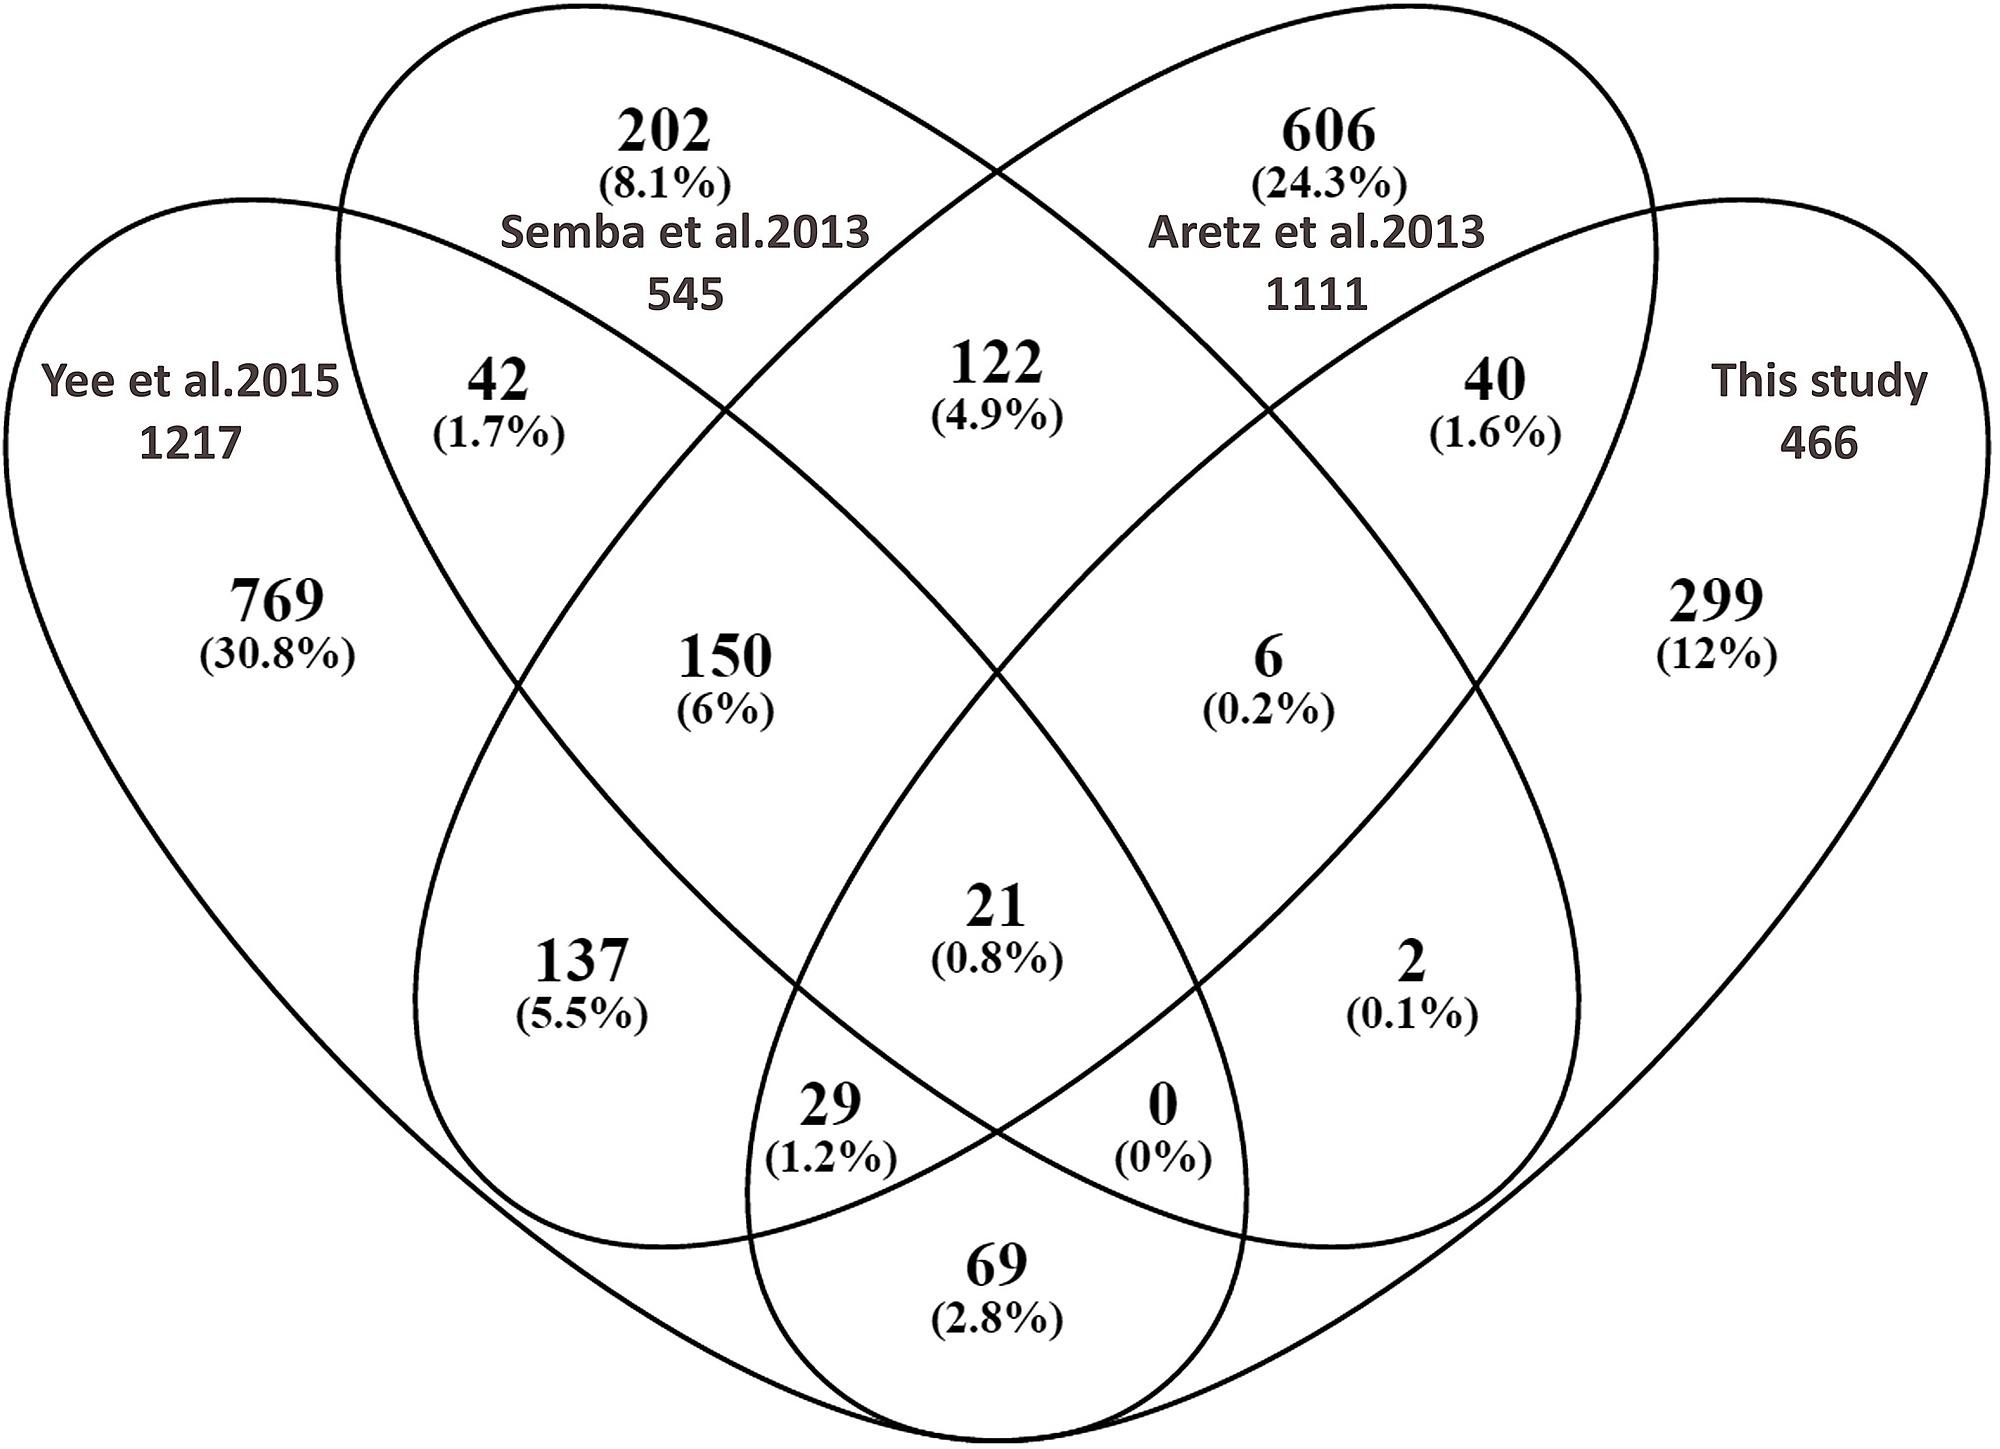 venn diagram comparing the proteomes of four human vitreous studies rh figshare com 3 Circle Venn Diagrams Math Printable Venn Diagram